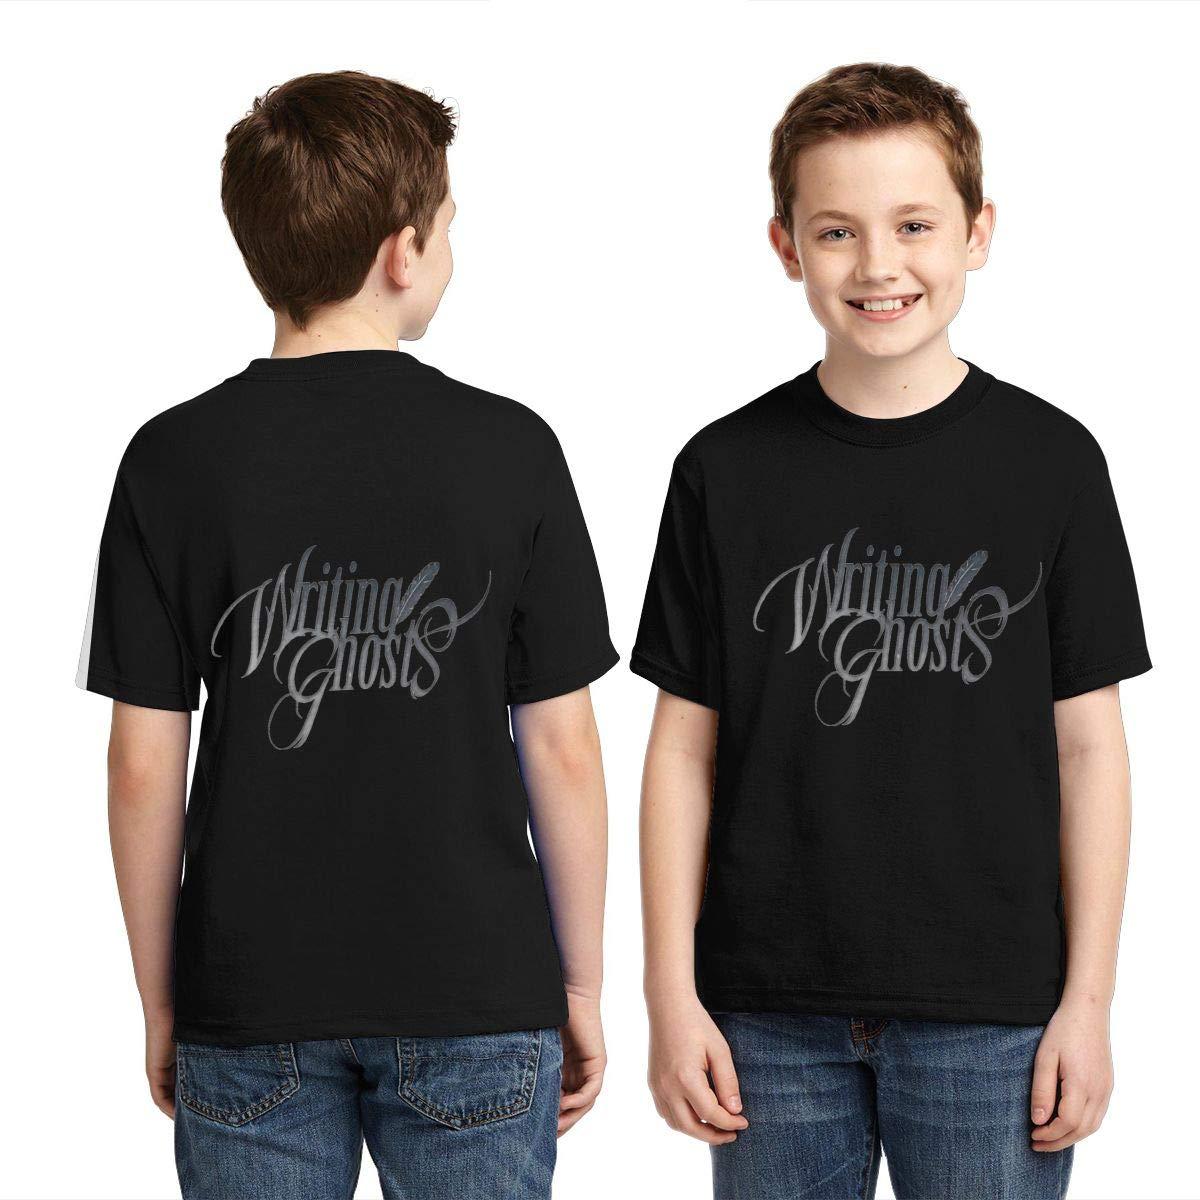 Xshuhua Boys,Girls,Youth Florida Georgia Line T Shirt